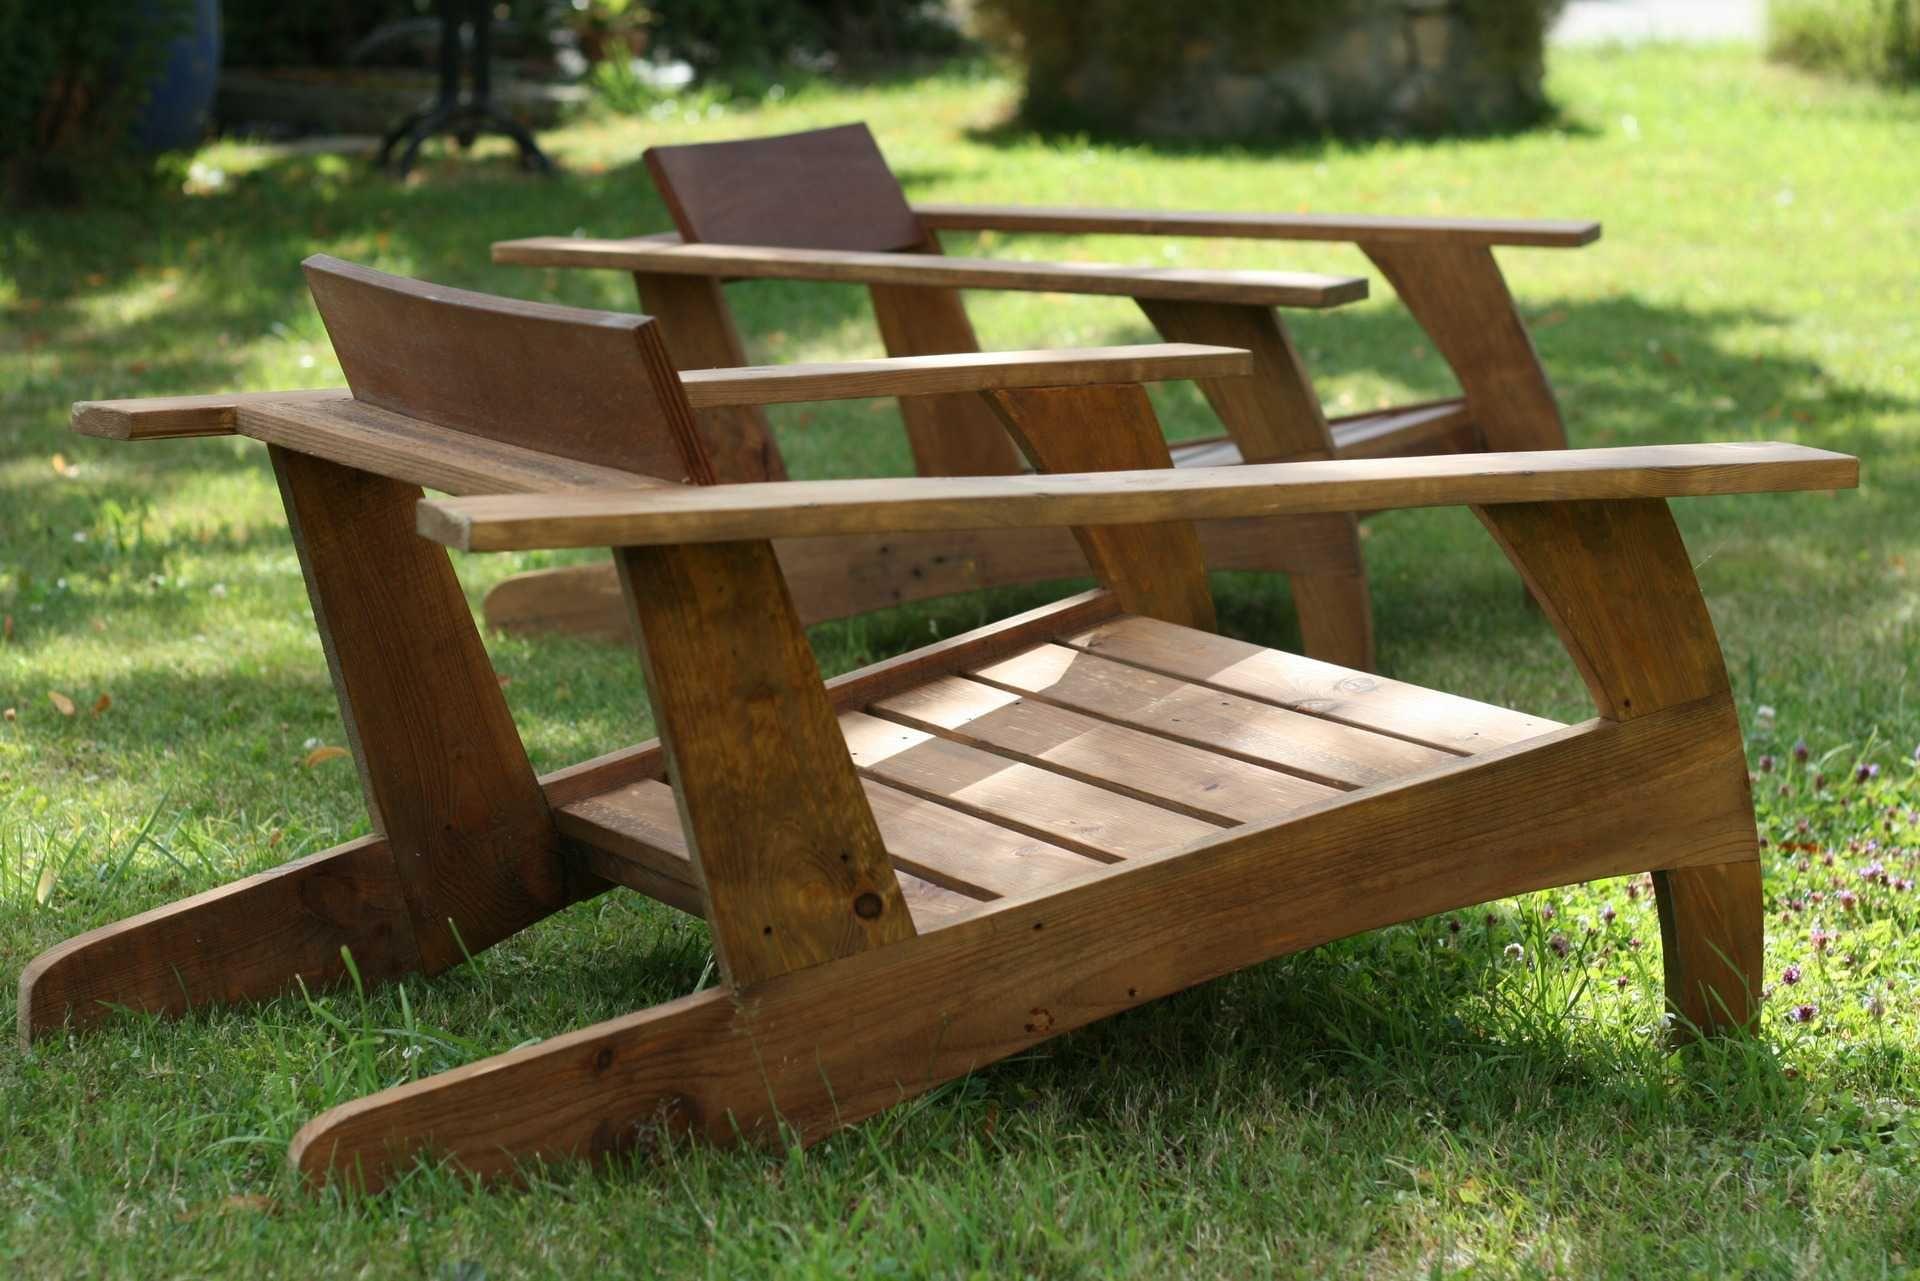 Mobilier de jardin en bois palette 2017 et meuble de jardin en ...